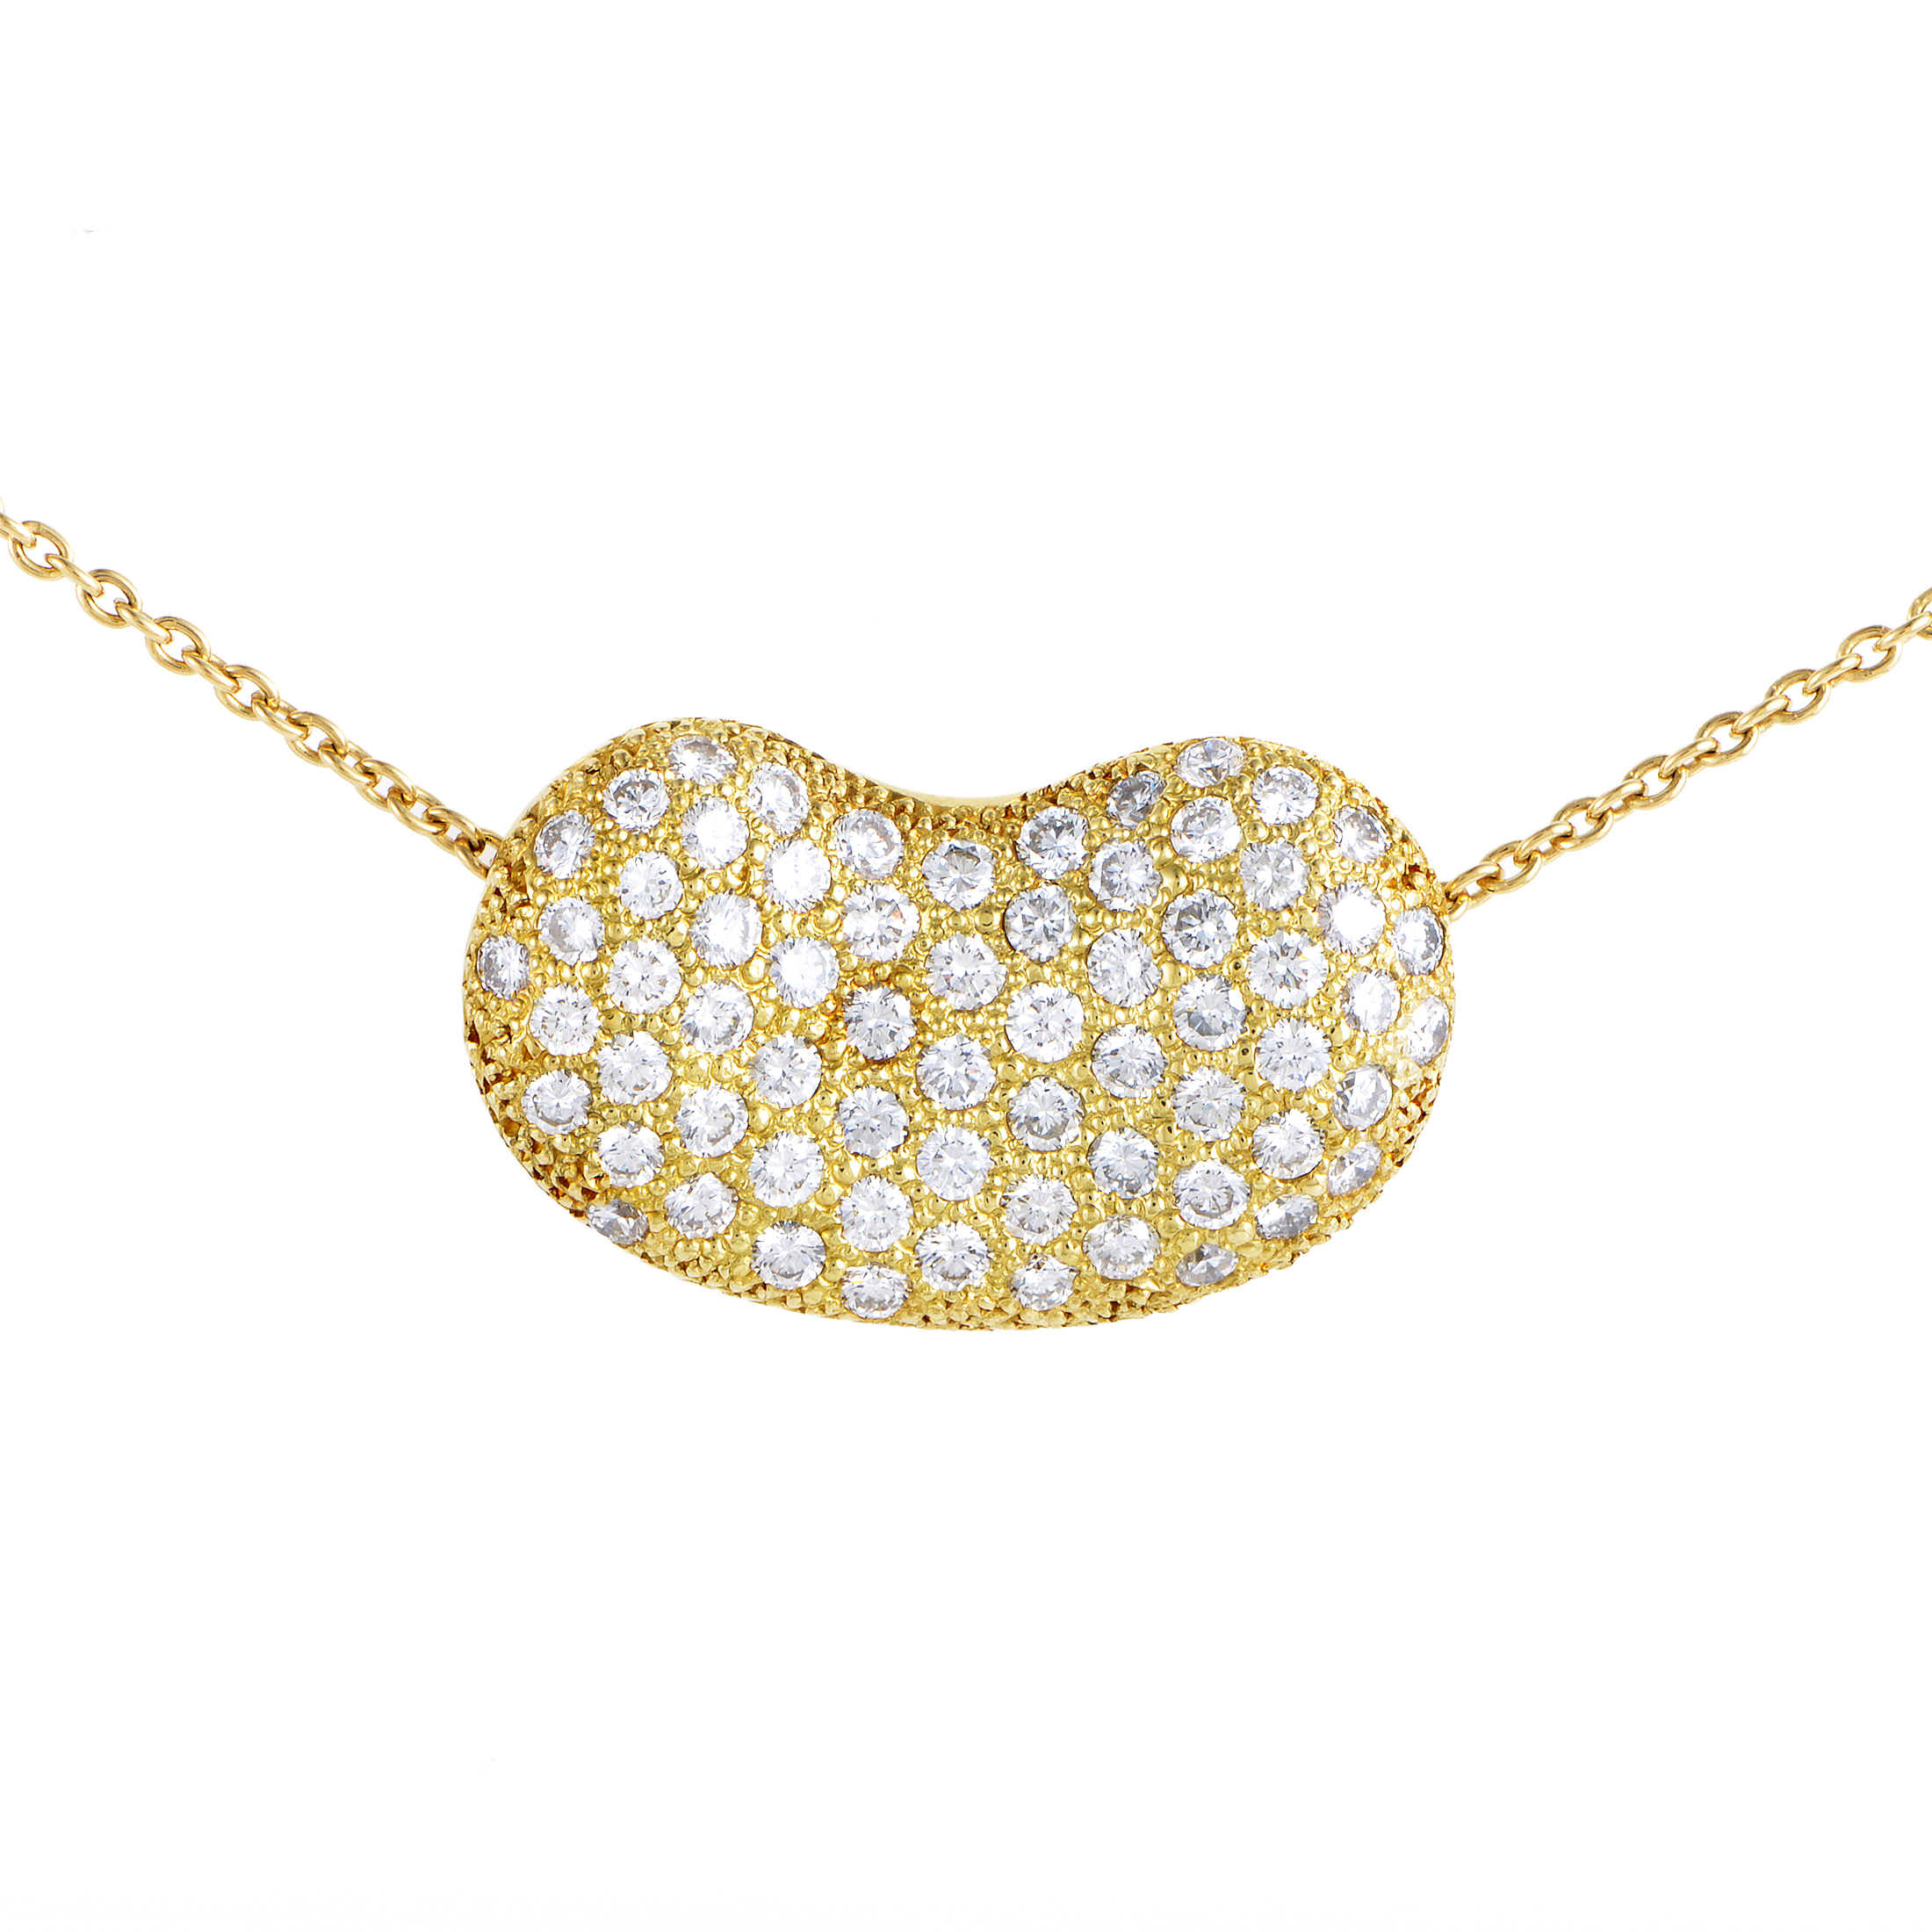 Tiffany & Co. Elsa Peretti 18K Yellow Gold Diamond Pave Bean Pendant Necklace